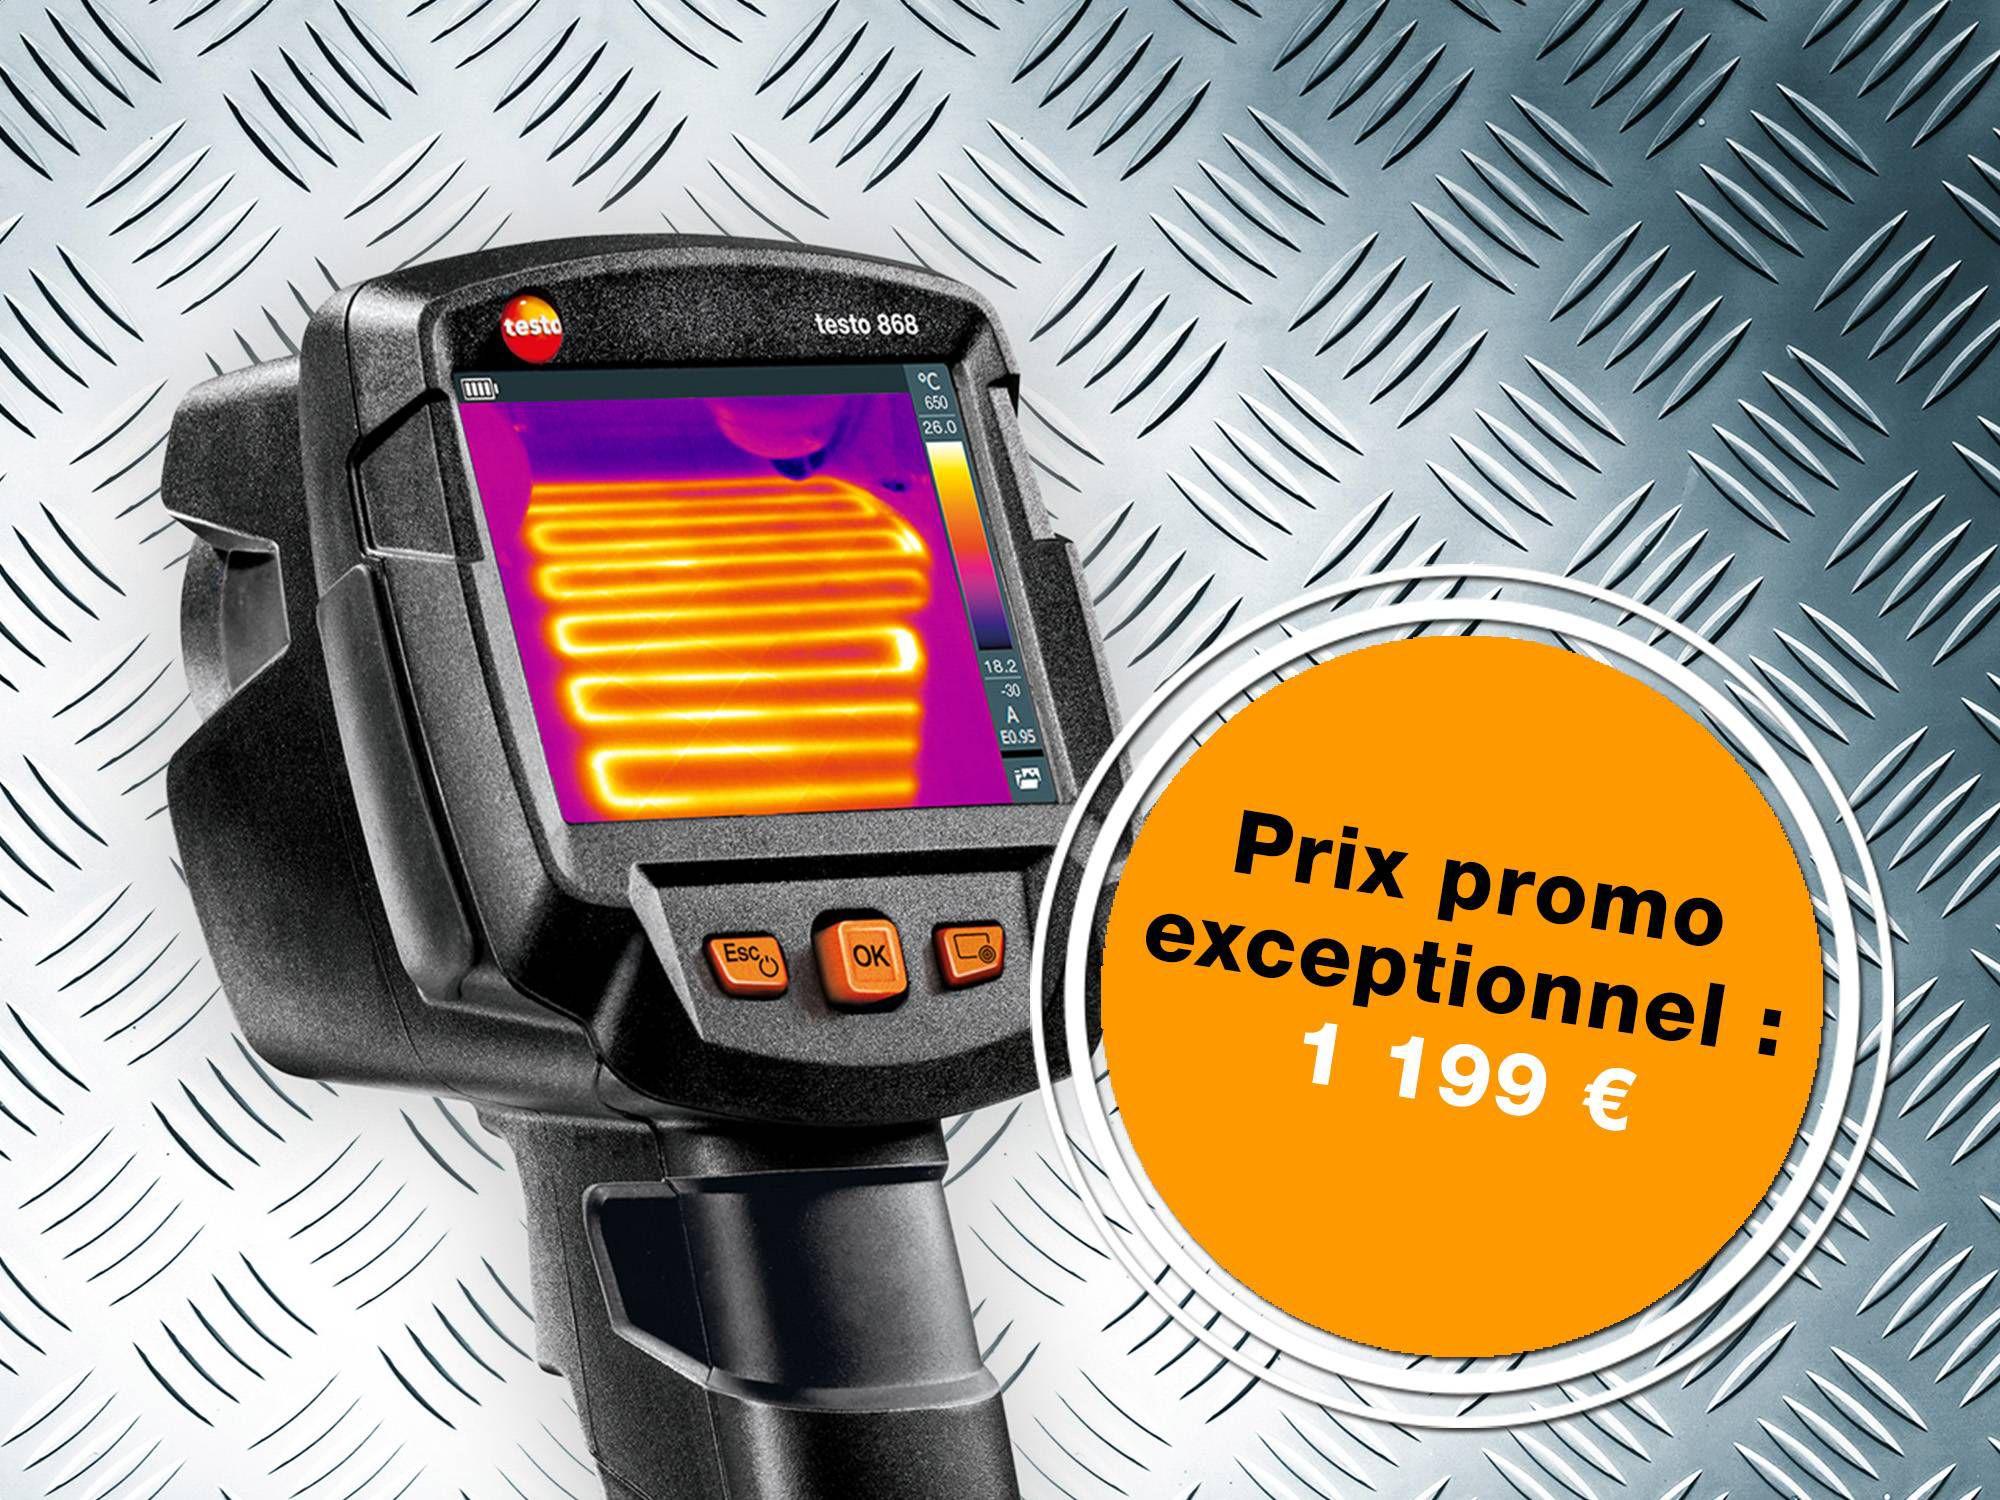 TI-promo-2020-teaser-868-2000x1500px-FR.jpg